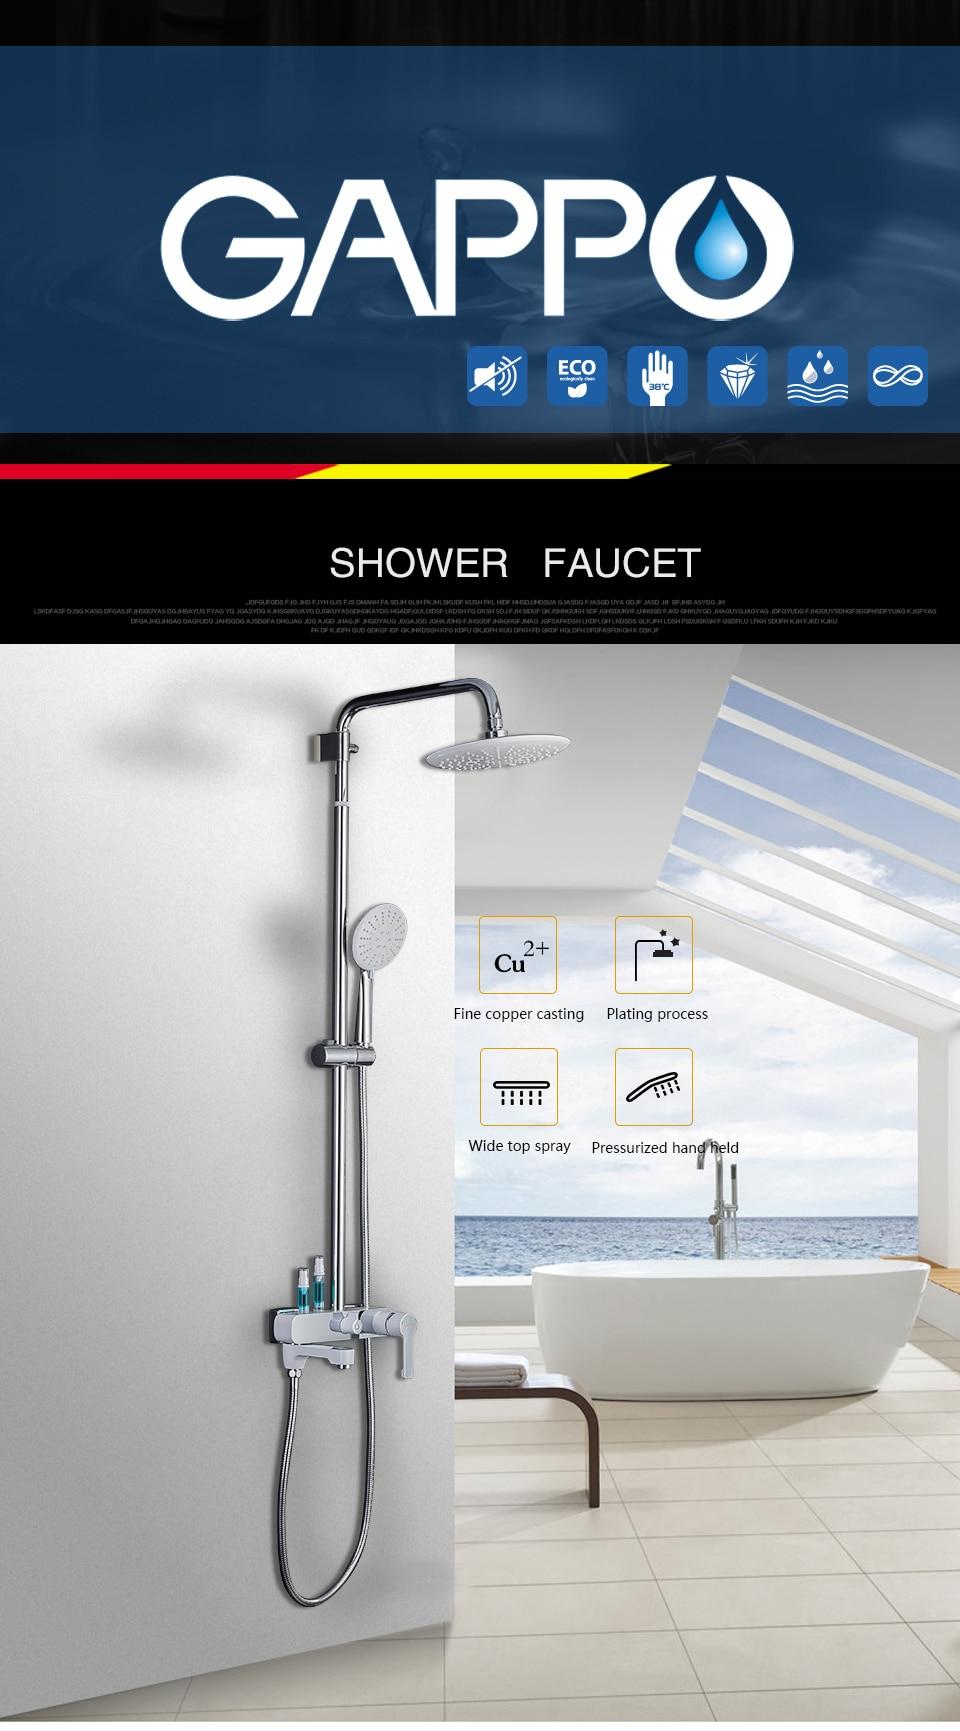 HTB1WLfpXInrK1RjSspkq6yuvXXaG GAPPO shower faucets bathroom White chrome shower set bath bath mixer bathroom shower system G2402-8